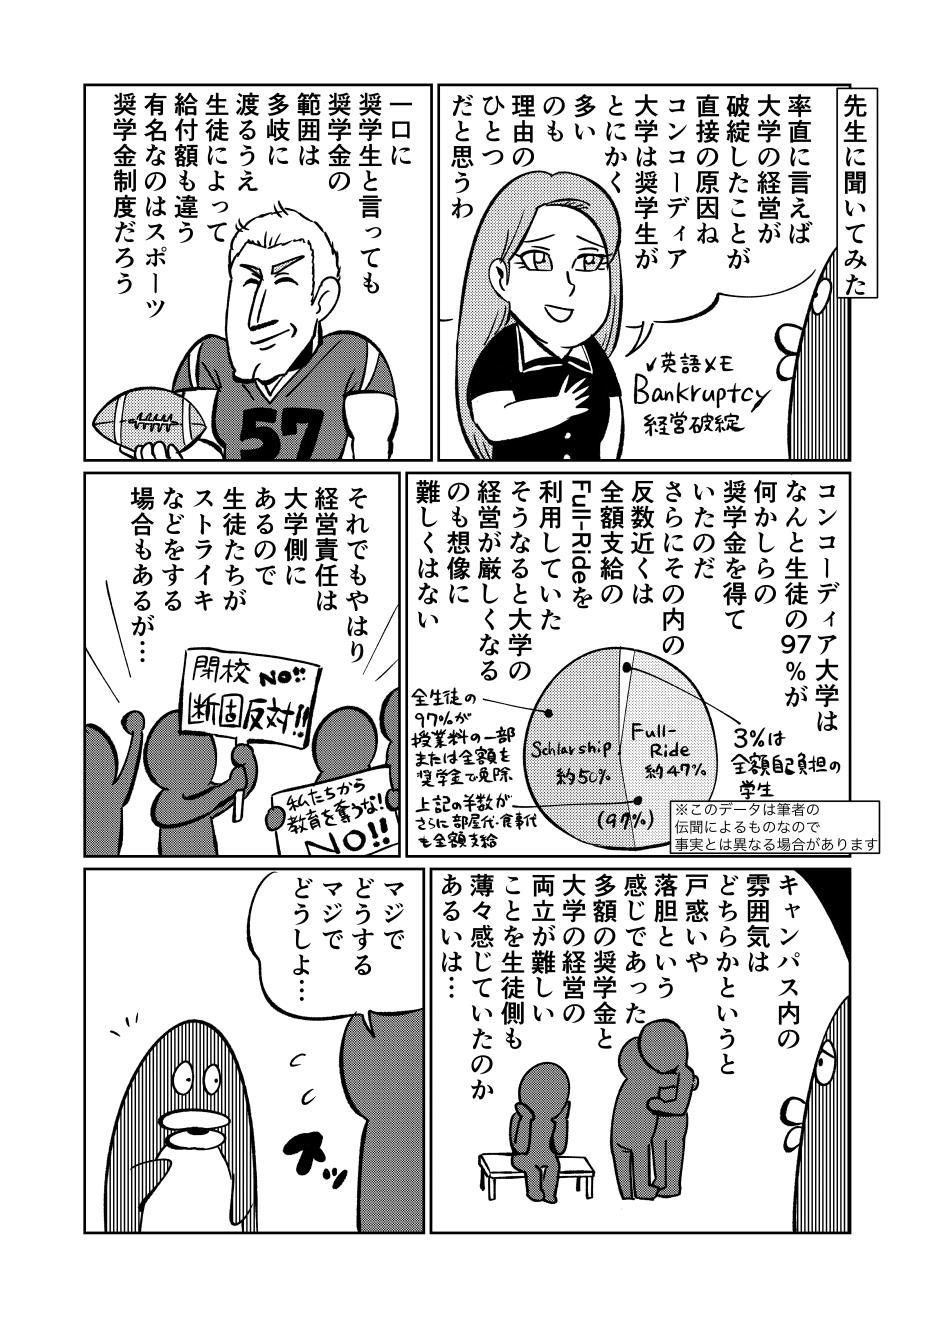 https://www.ryugaku.co.jp/blog/els_portland/upload/1203.jpg